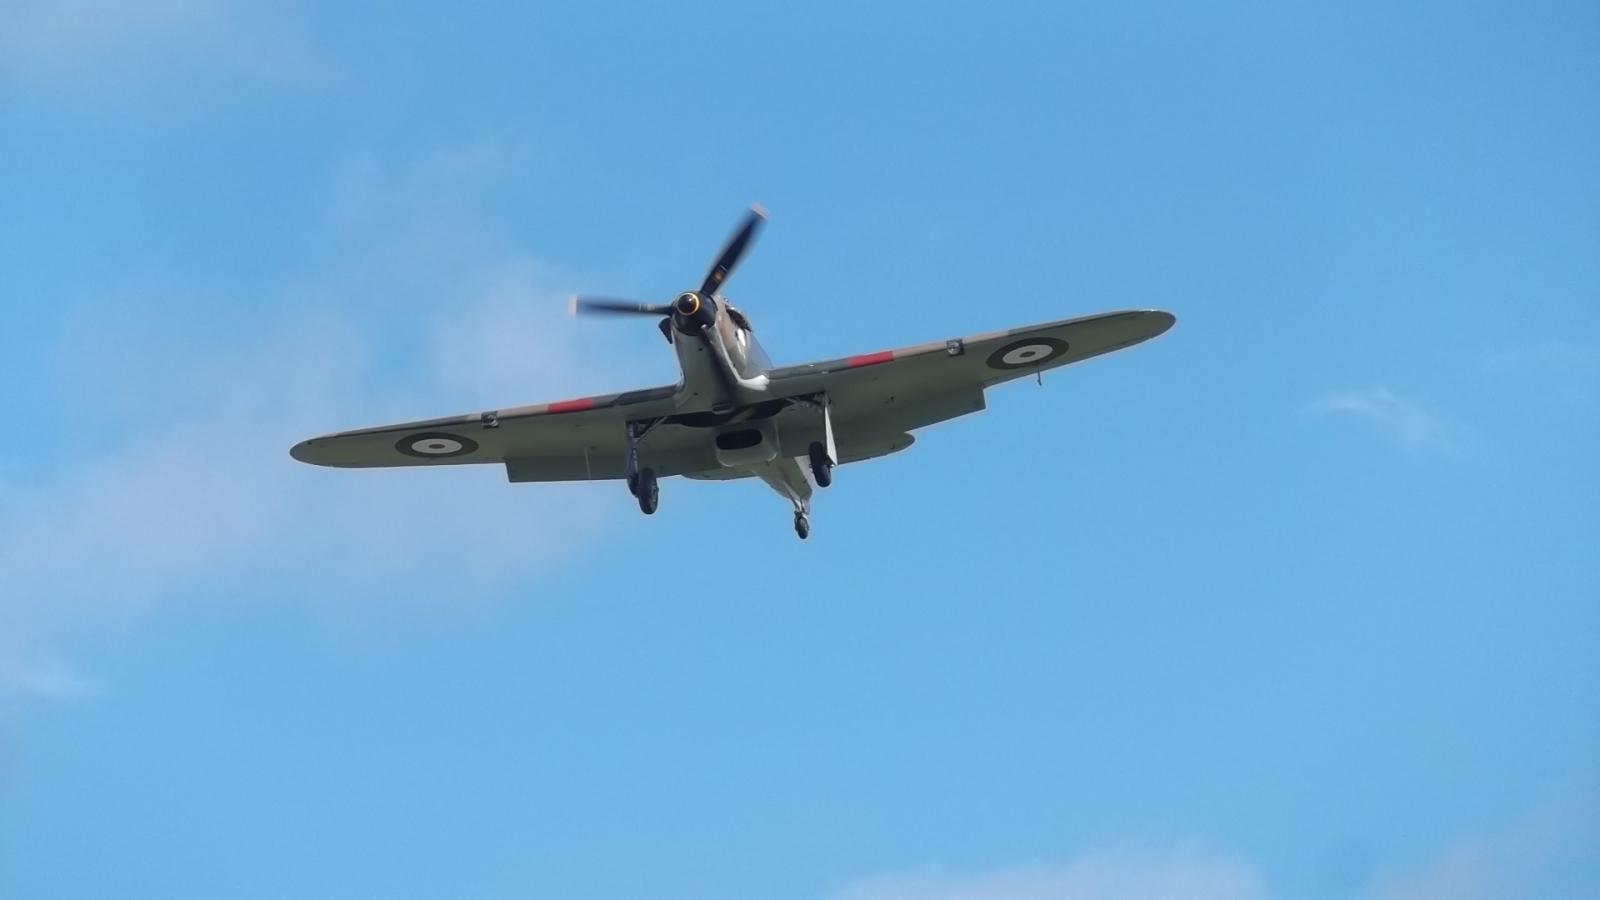 LF363 Landing at Goodwood 15 Sept 2015